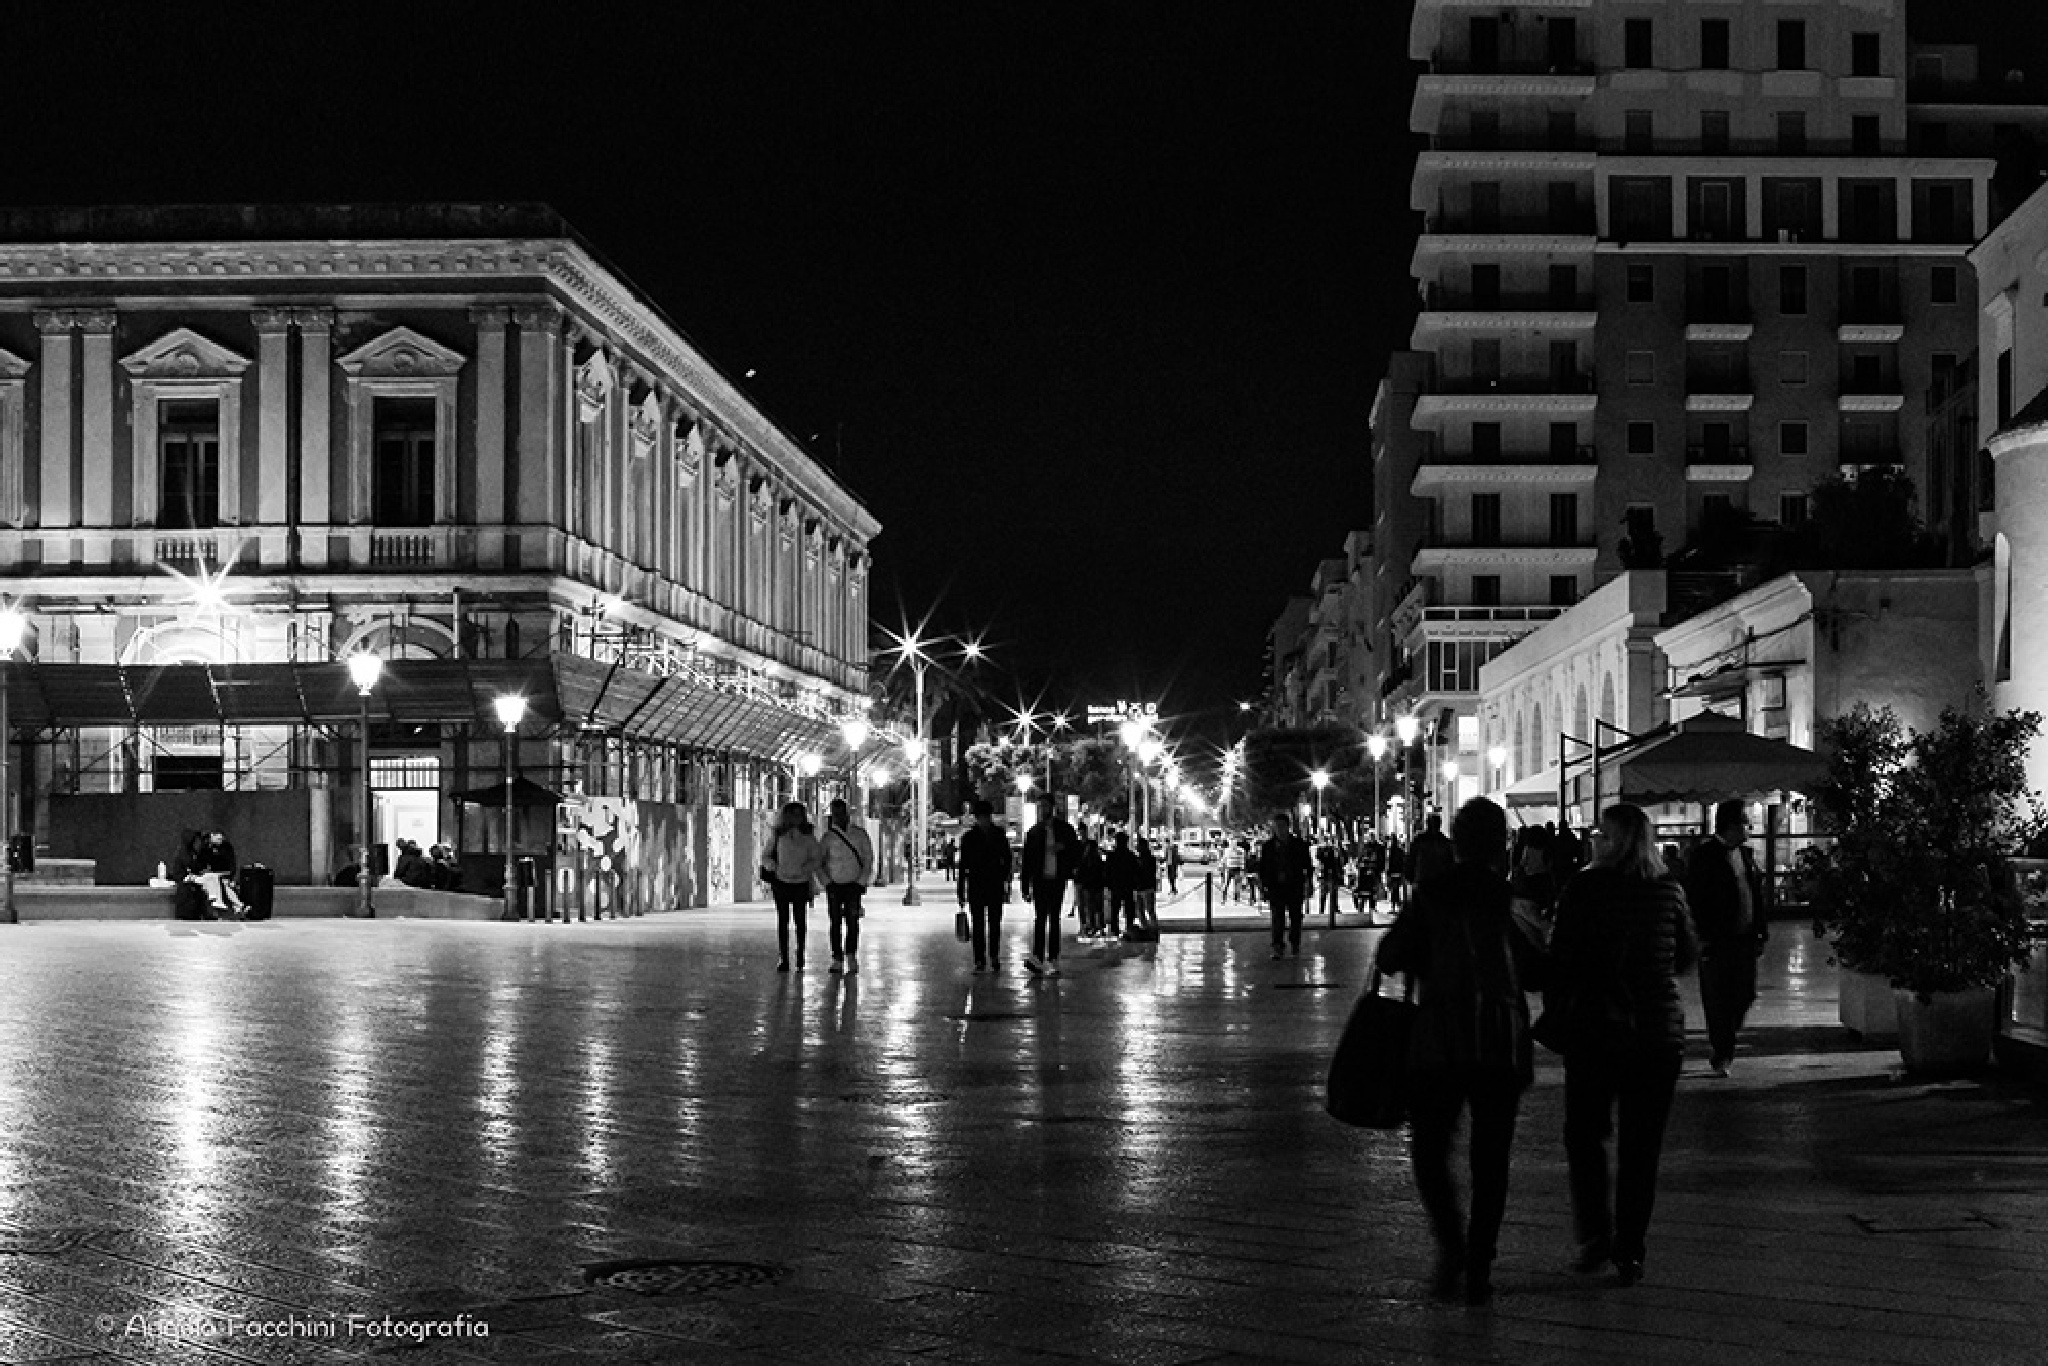 City by angelofacchini